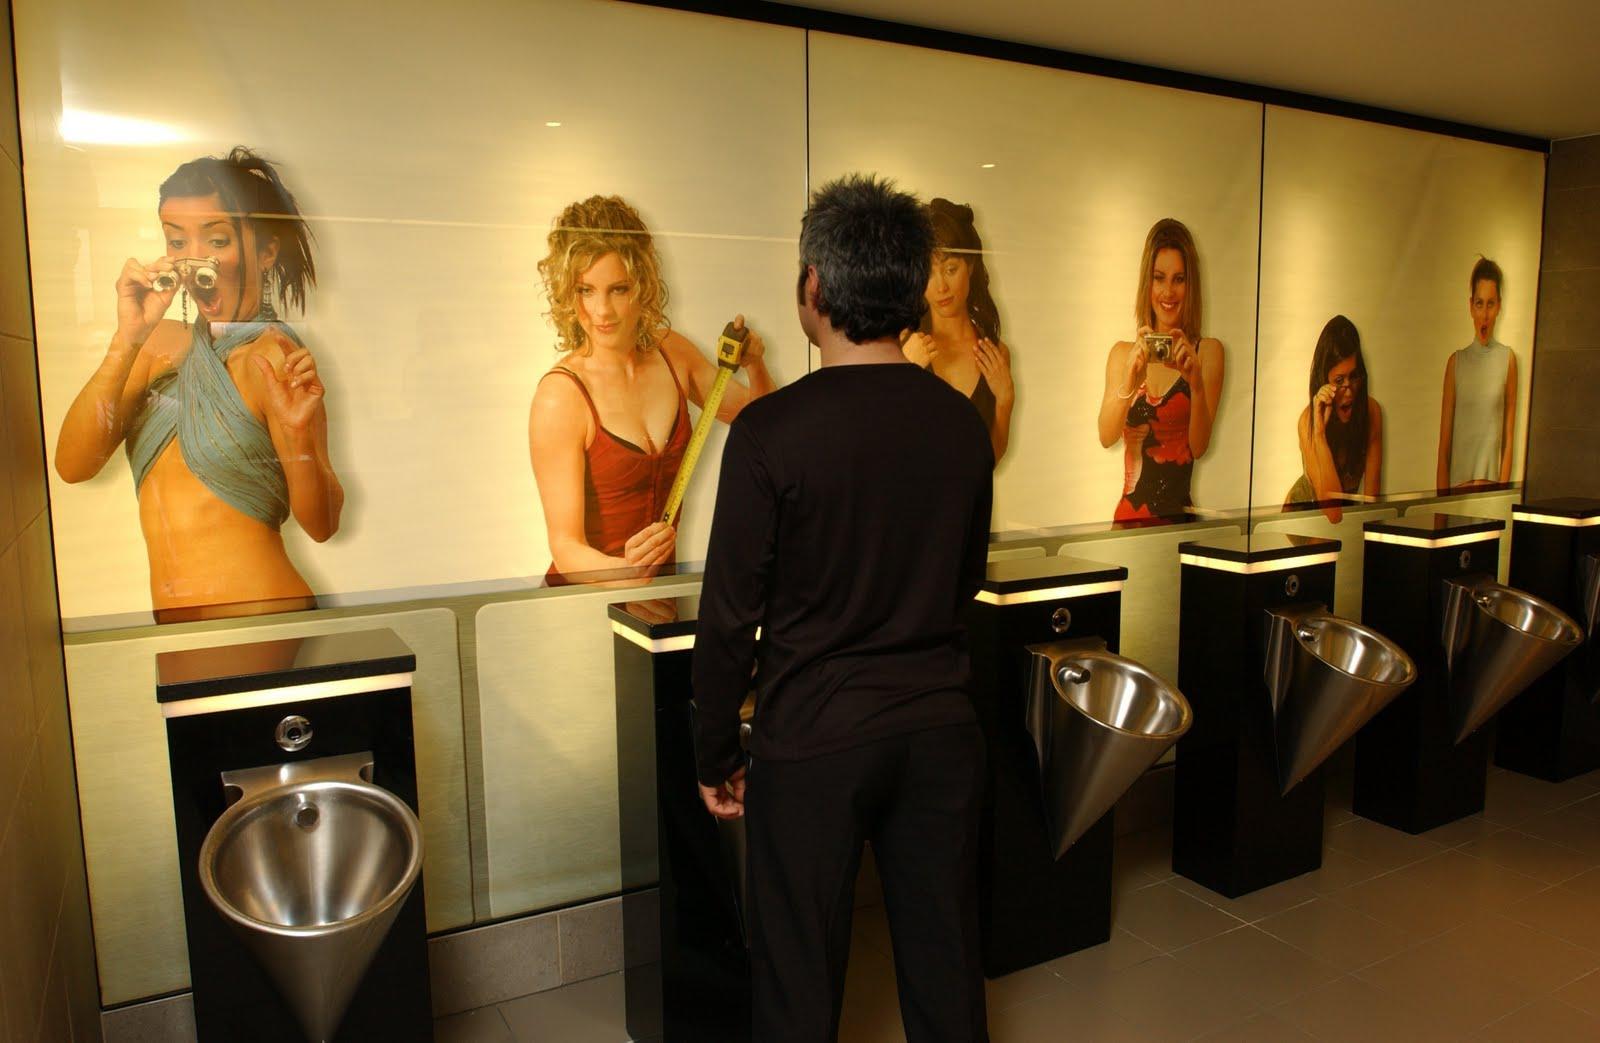 bathroom repair, Bathroom decor